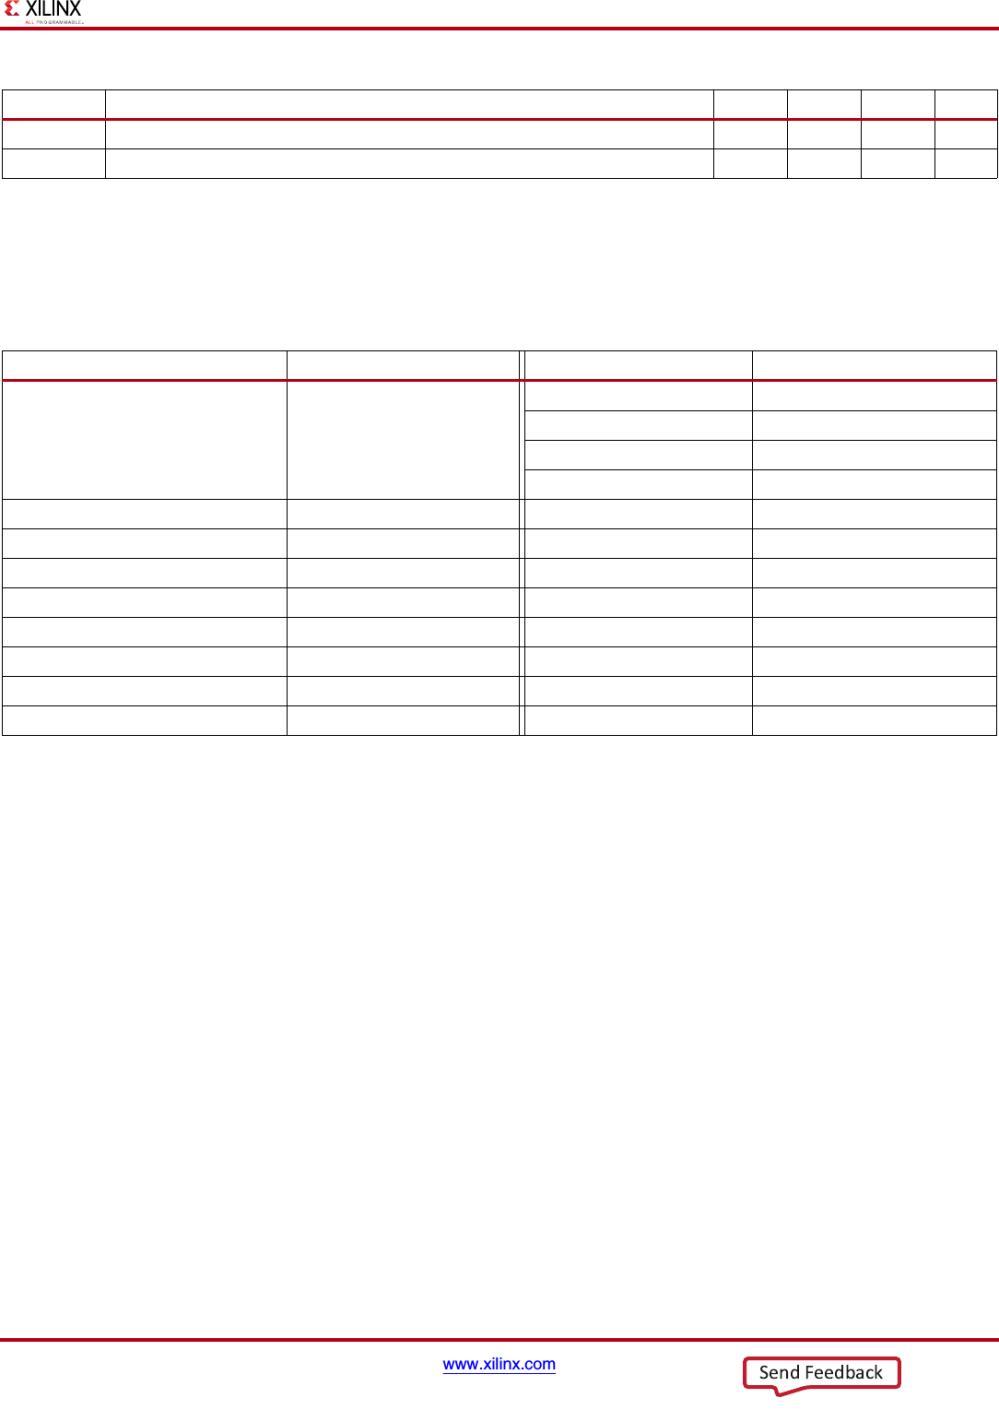 medium resolution of artix 7 fpgas data sheet dc and ac switching characteristics